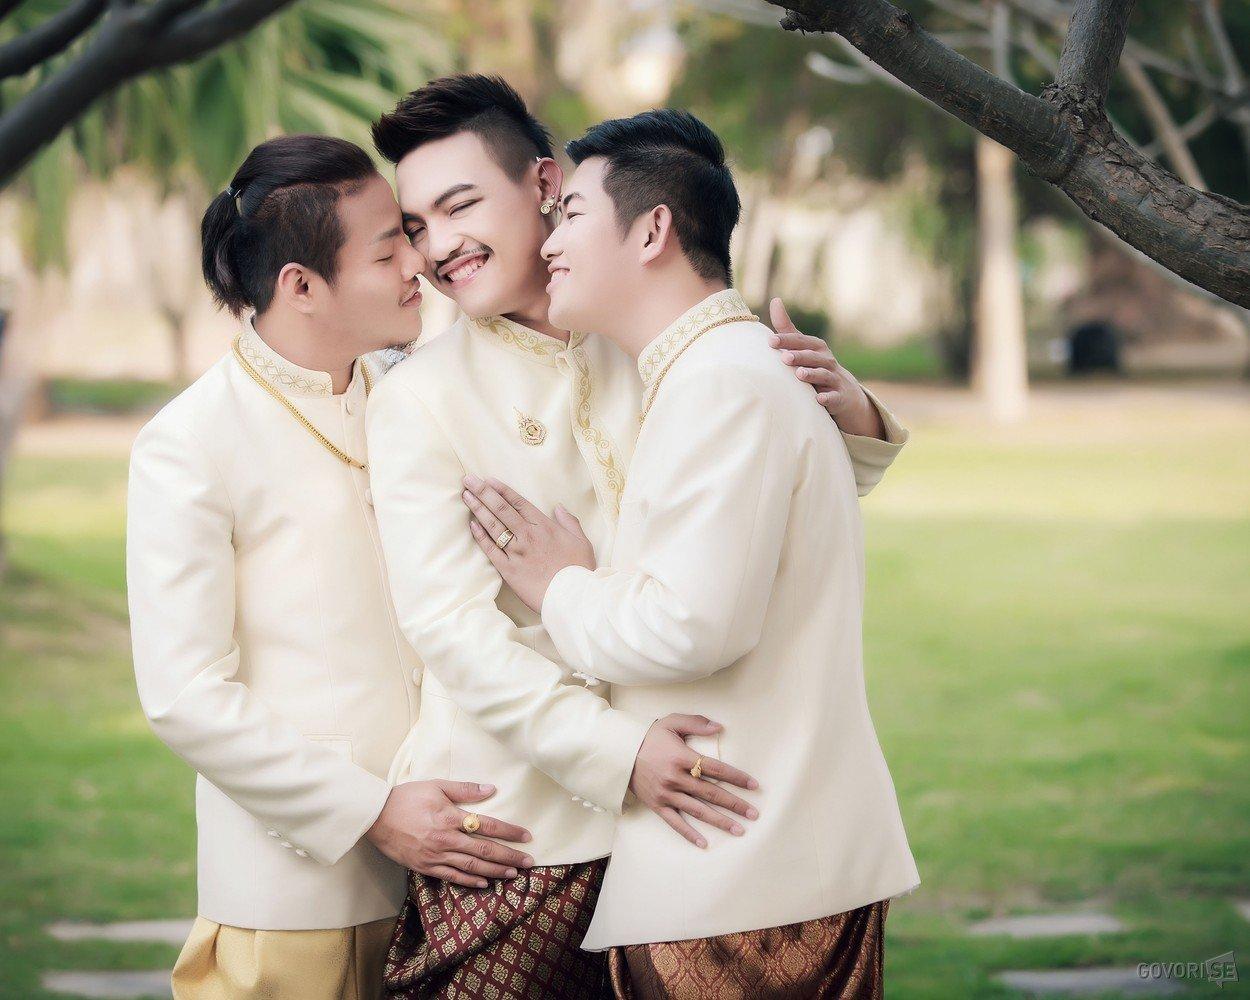 Thailand Threesome